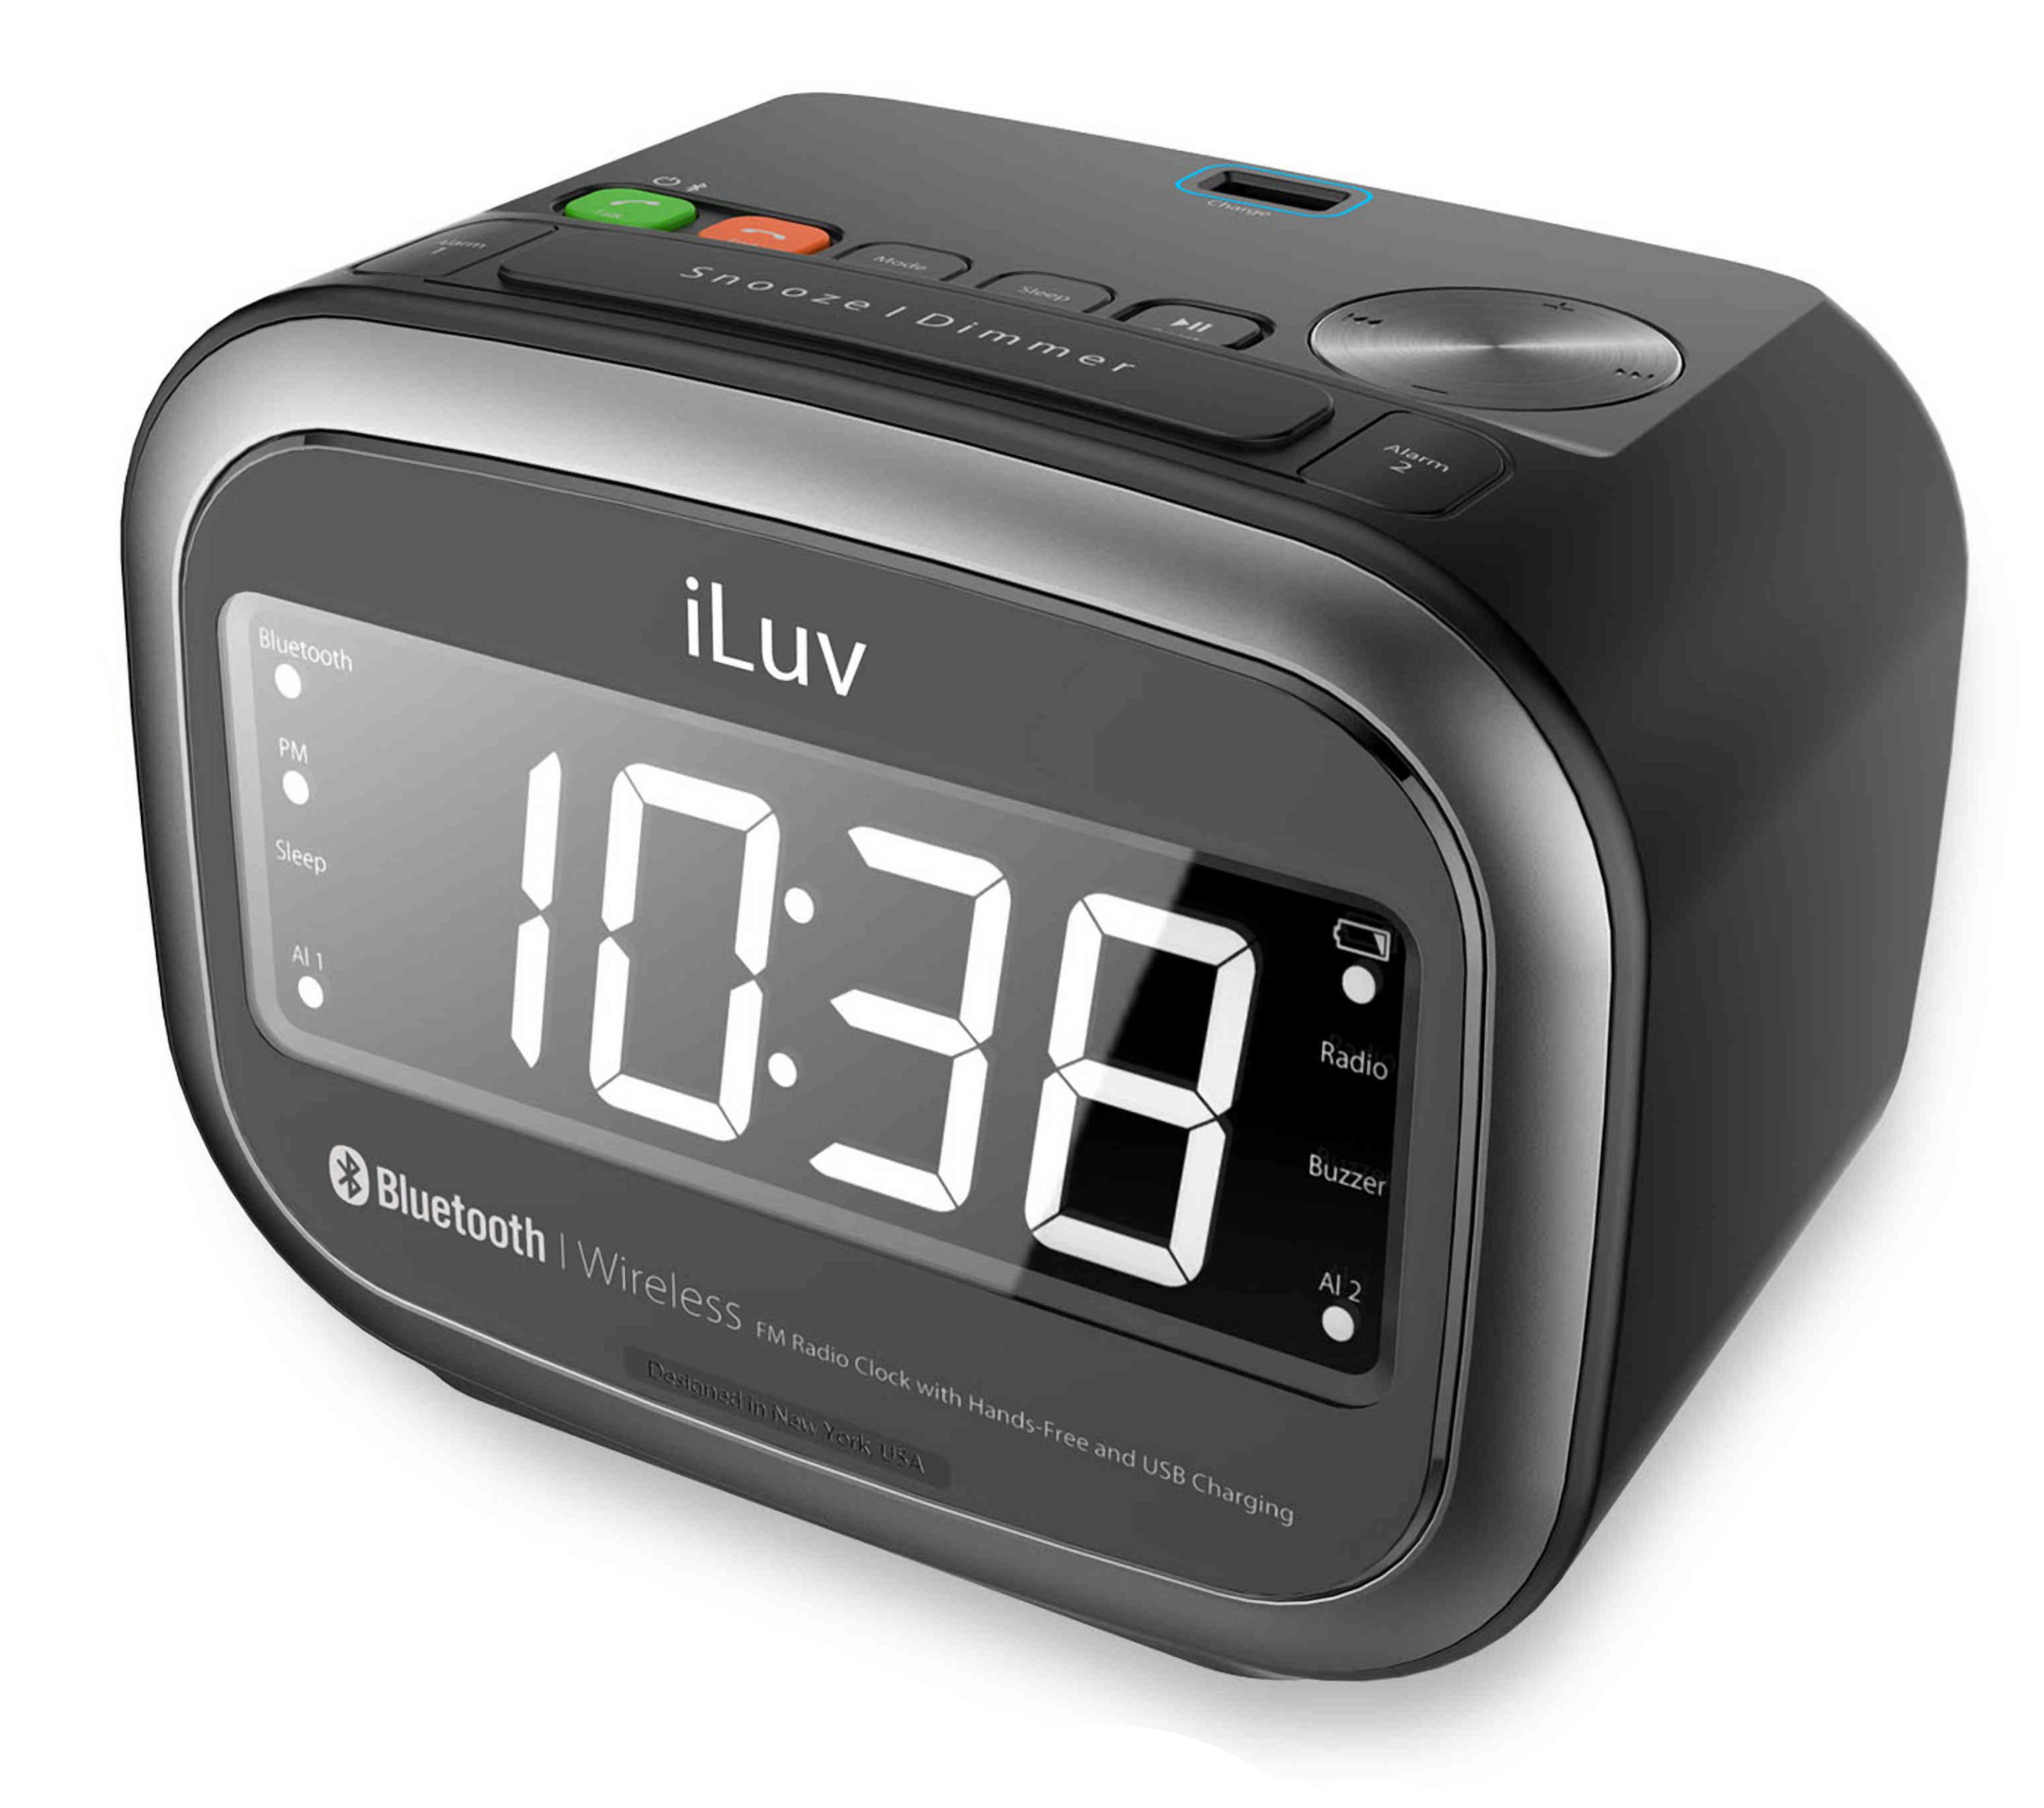 iLuv FM Radiowecker mit Dual Alarm, Bluetooth, USB »Morning Call 2«